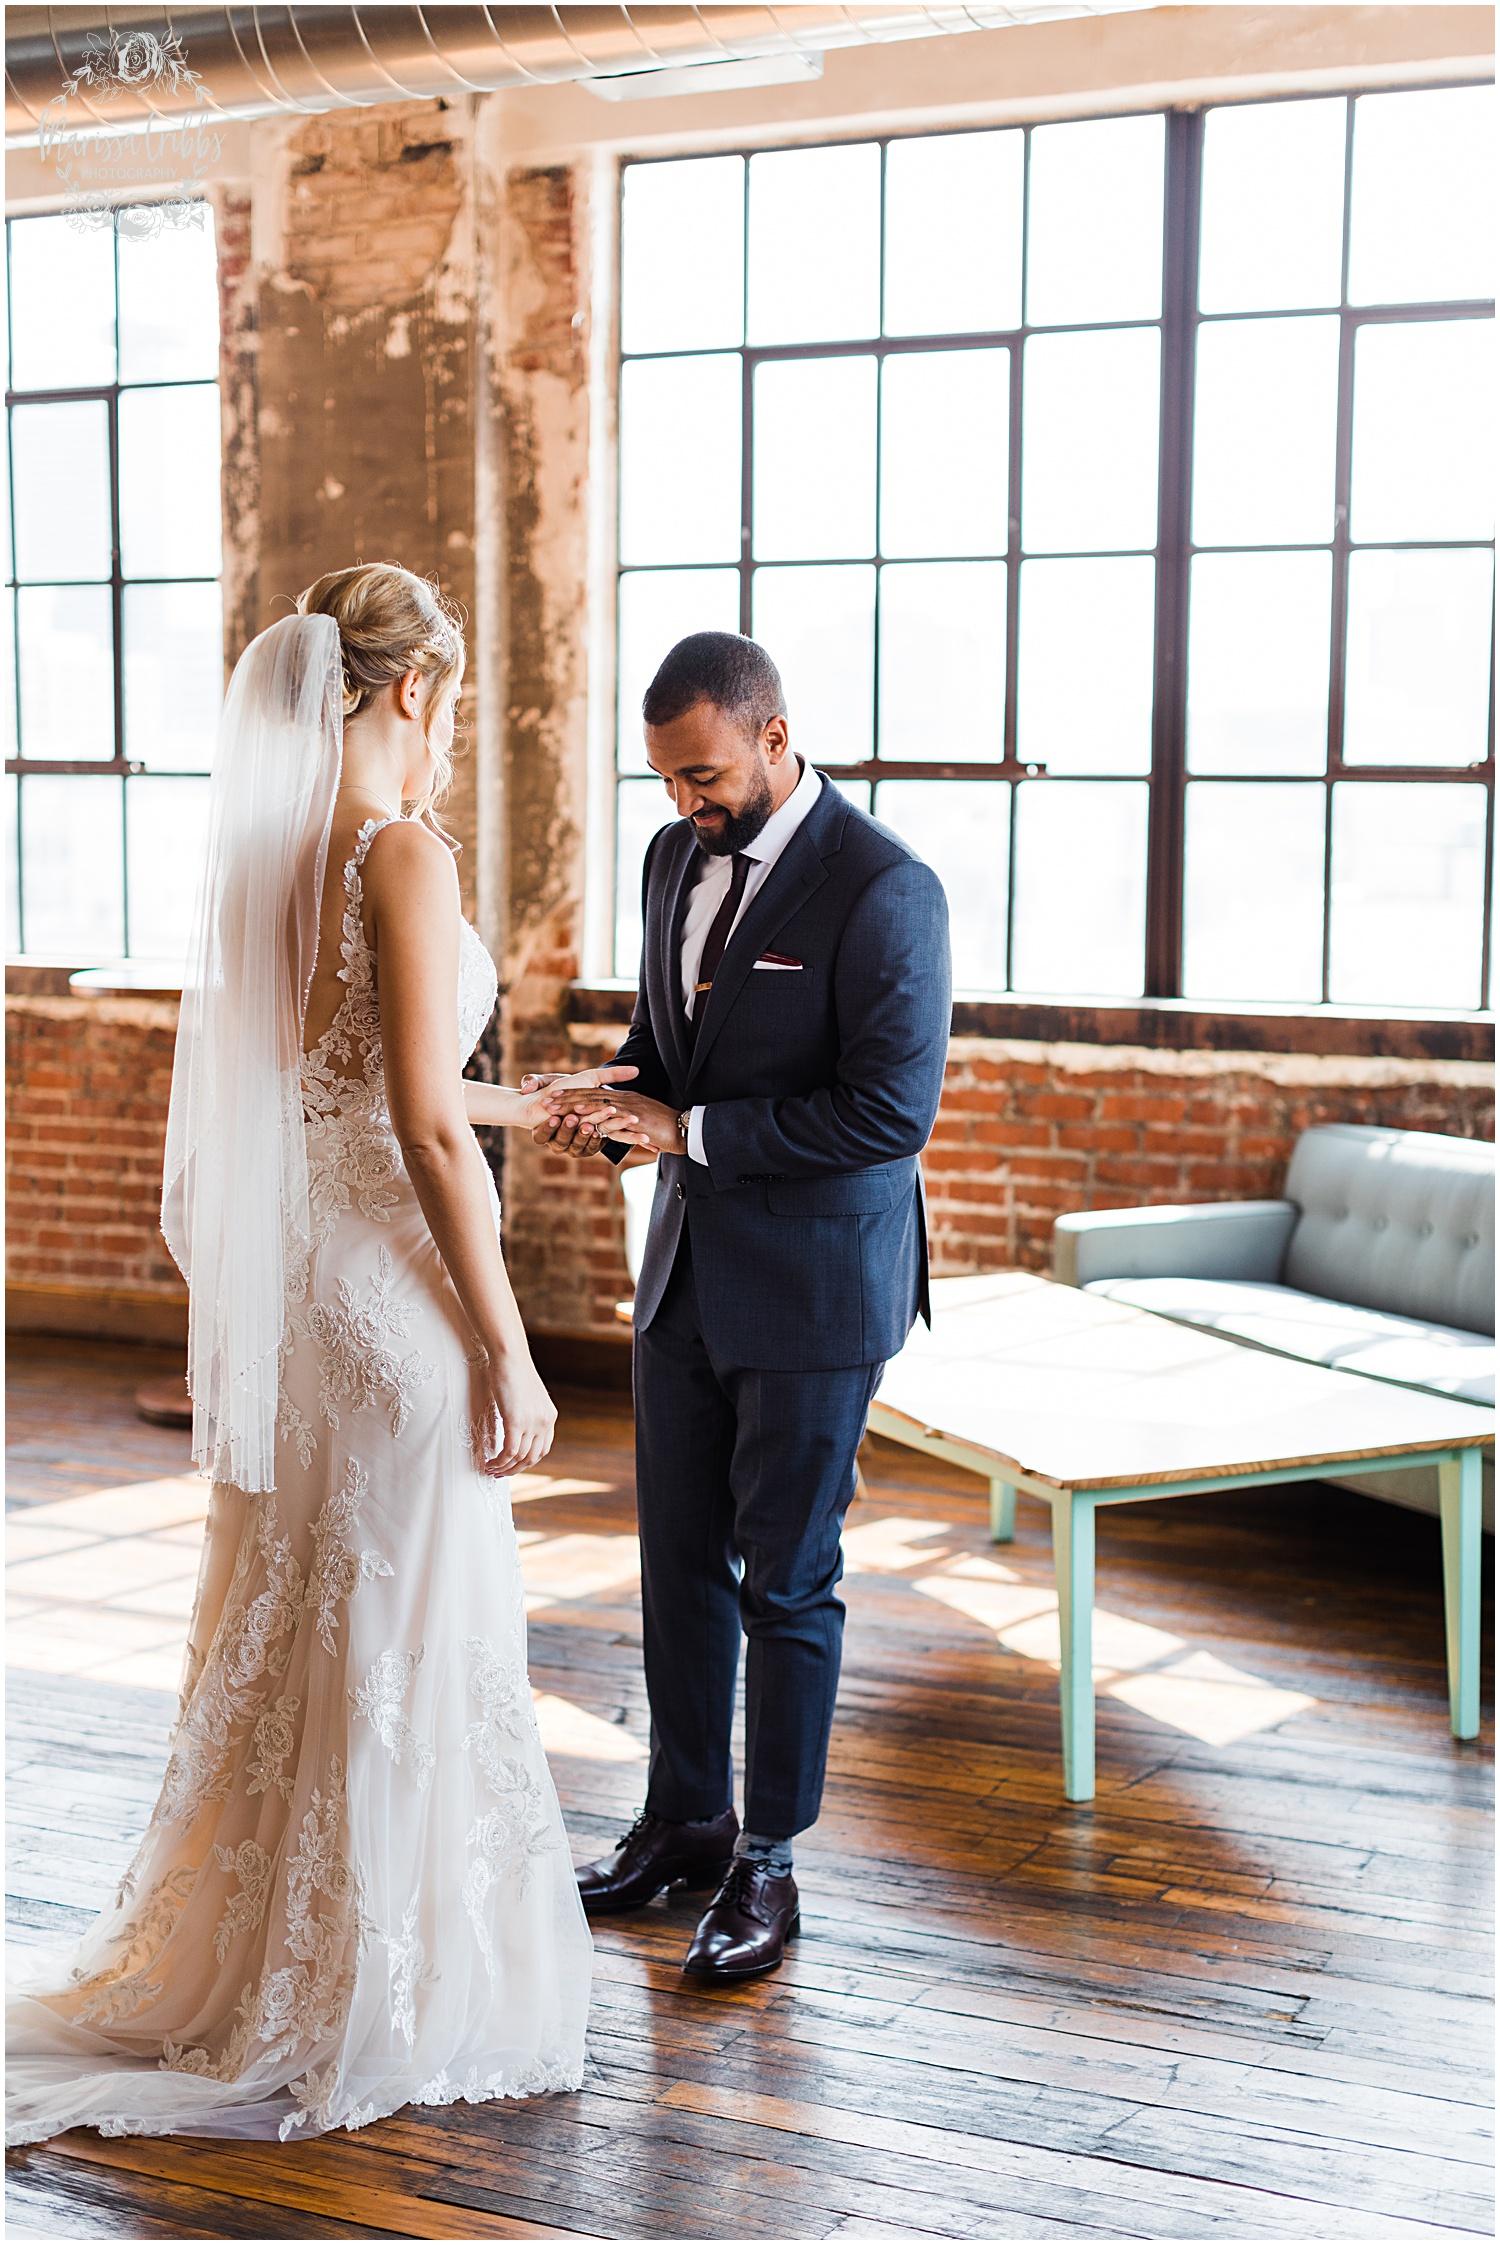 BAUER WEDDING   KELSEA & JUSTIN   MARISSA CRIBBS PHOTOGRAPHY_6507.jpg